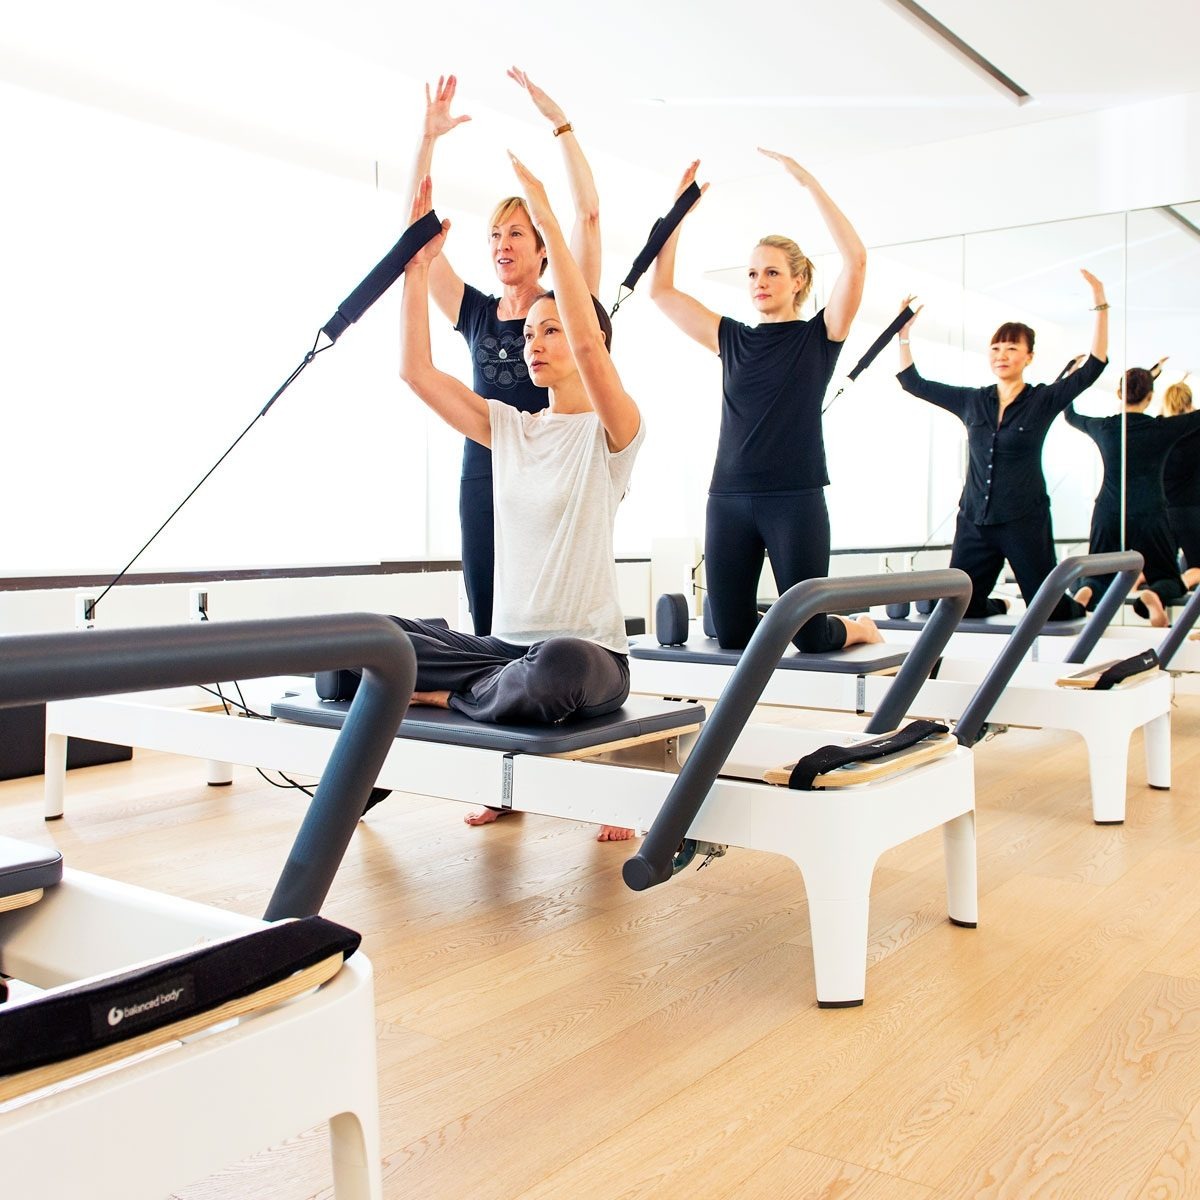 pilates-reformer-abu-dhabi-personal-trainers